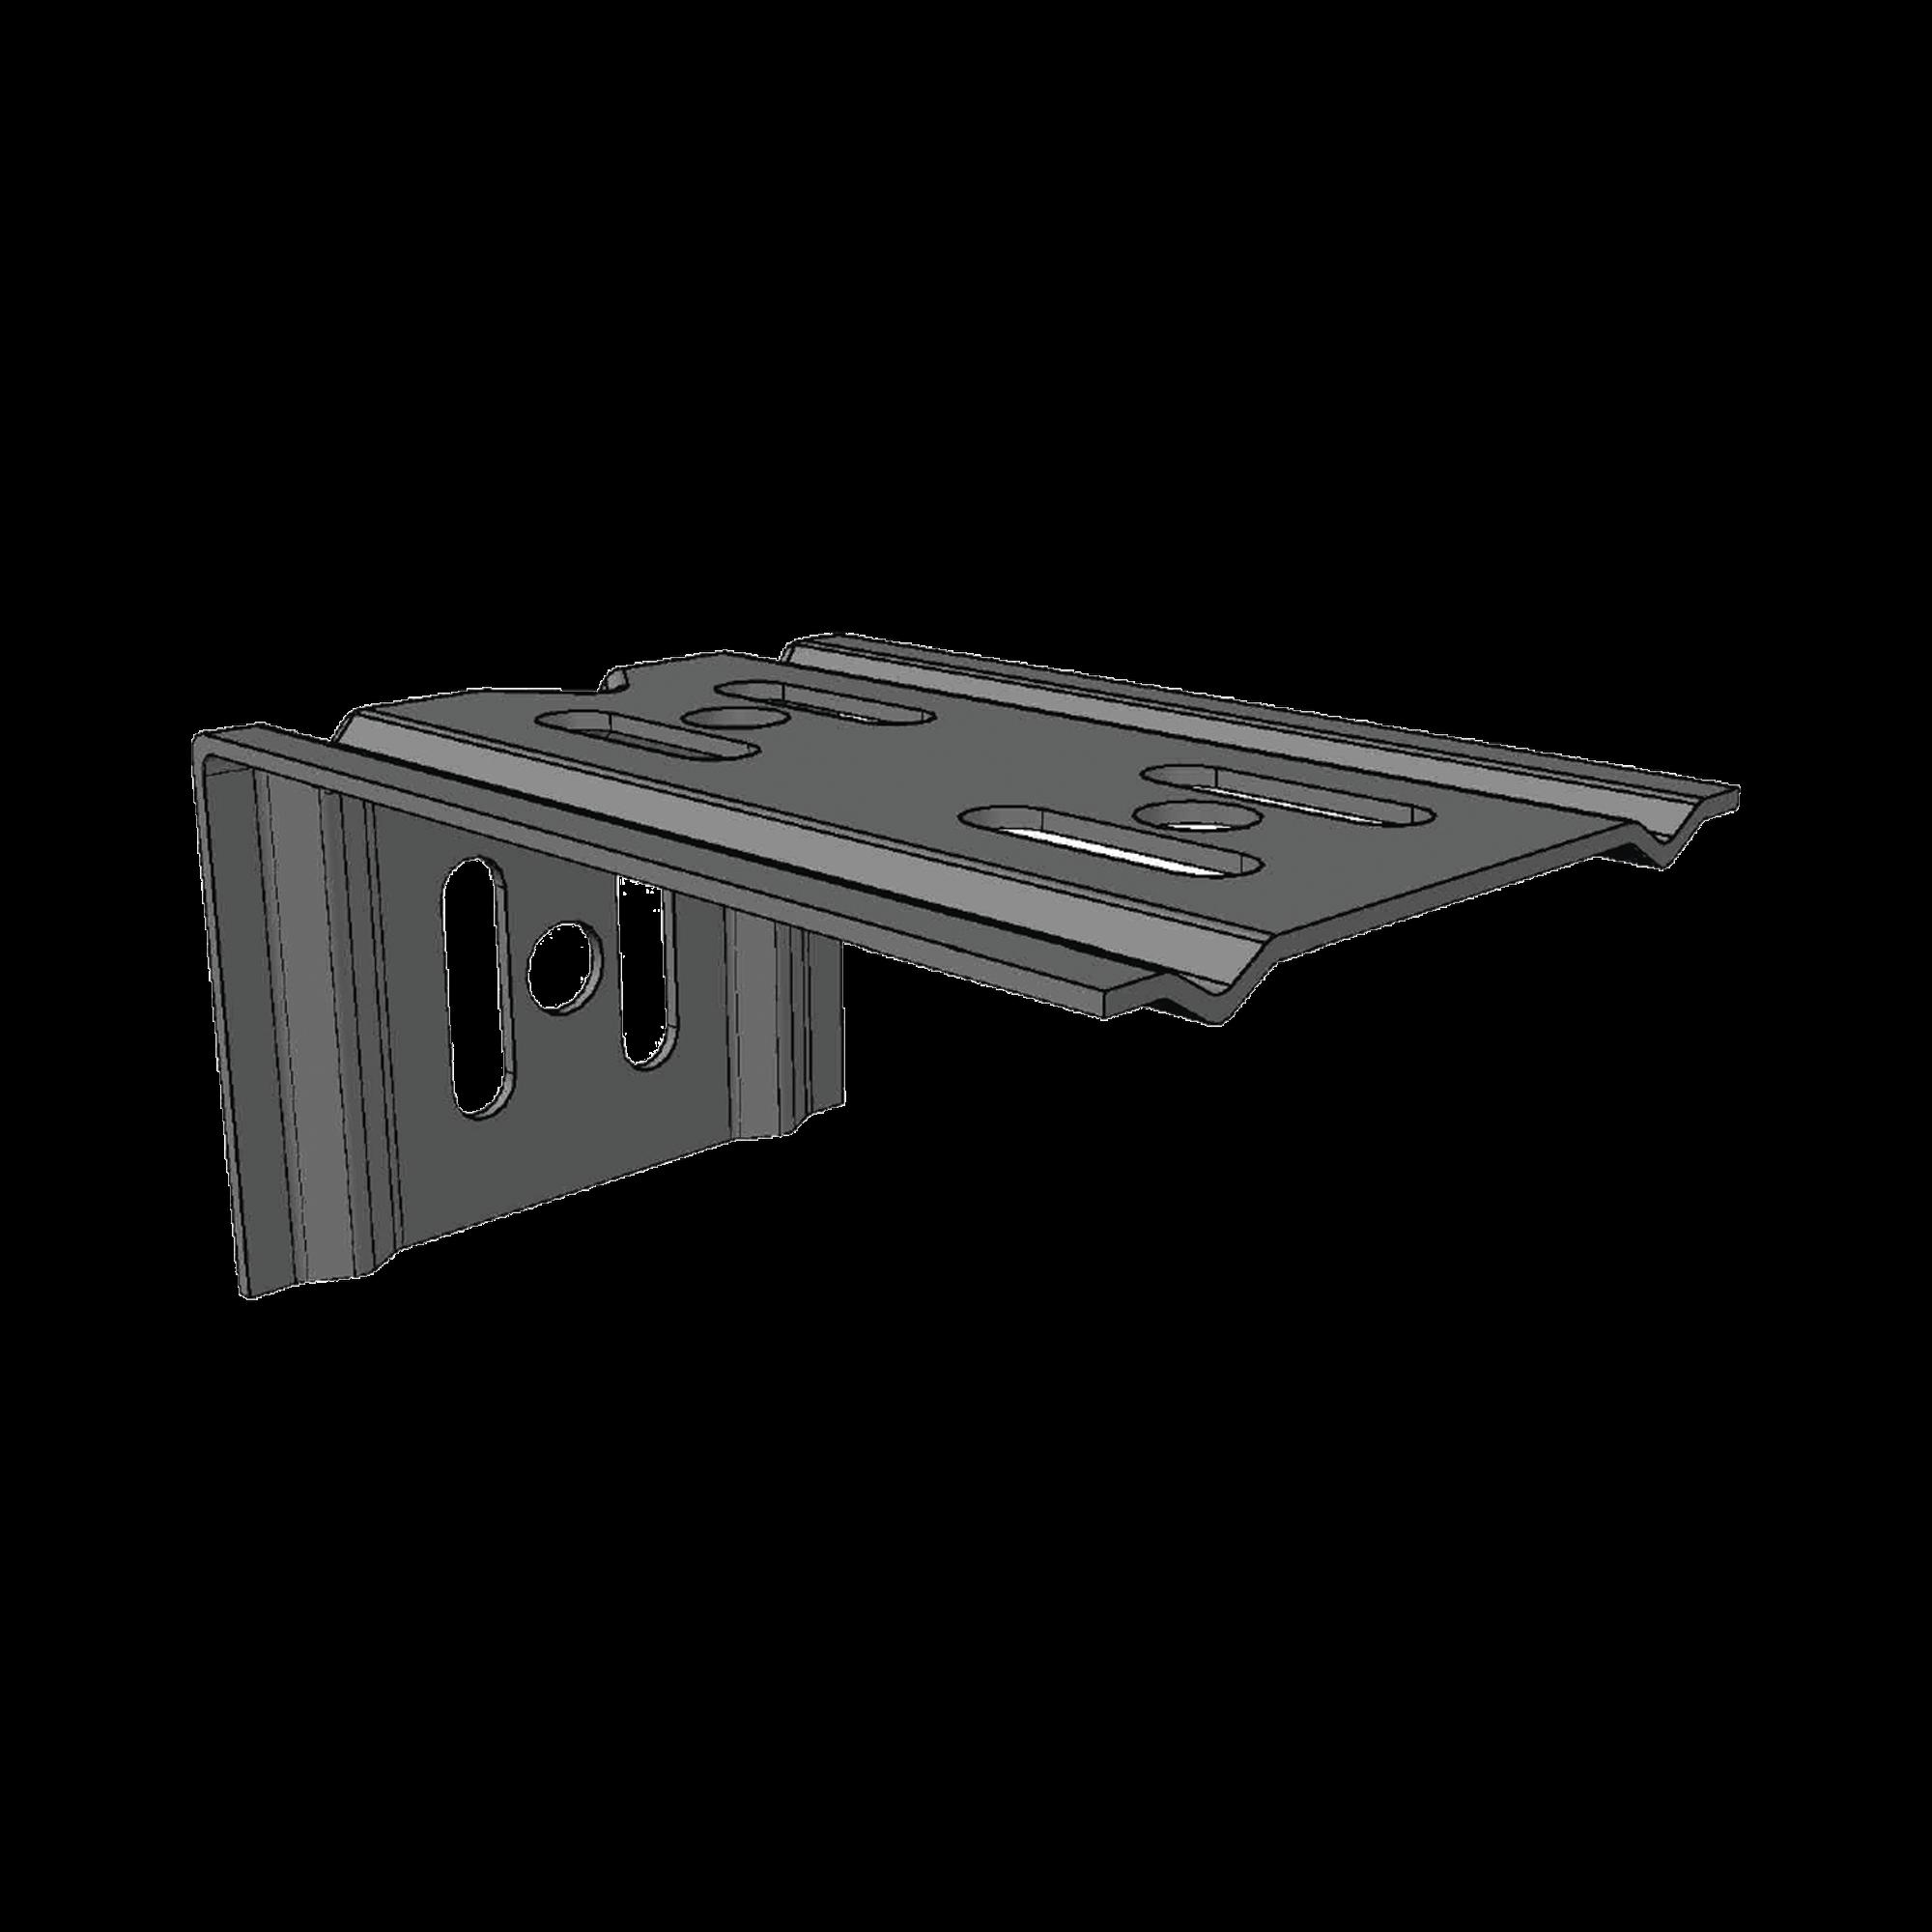 Ménsula económica MallaFils, para montaje en pared, para anchos de charola de 100 mm, con acabado electrozinc